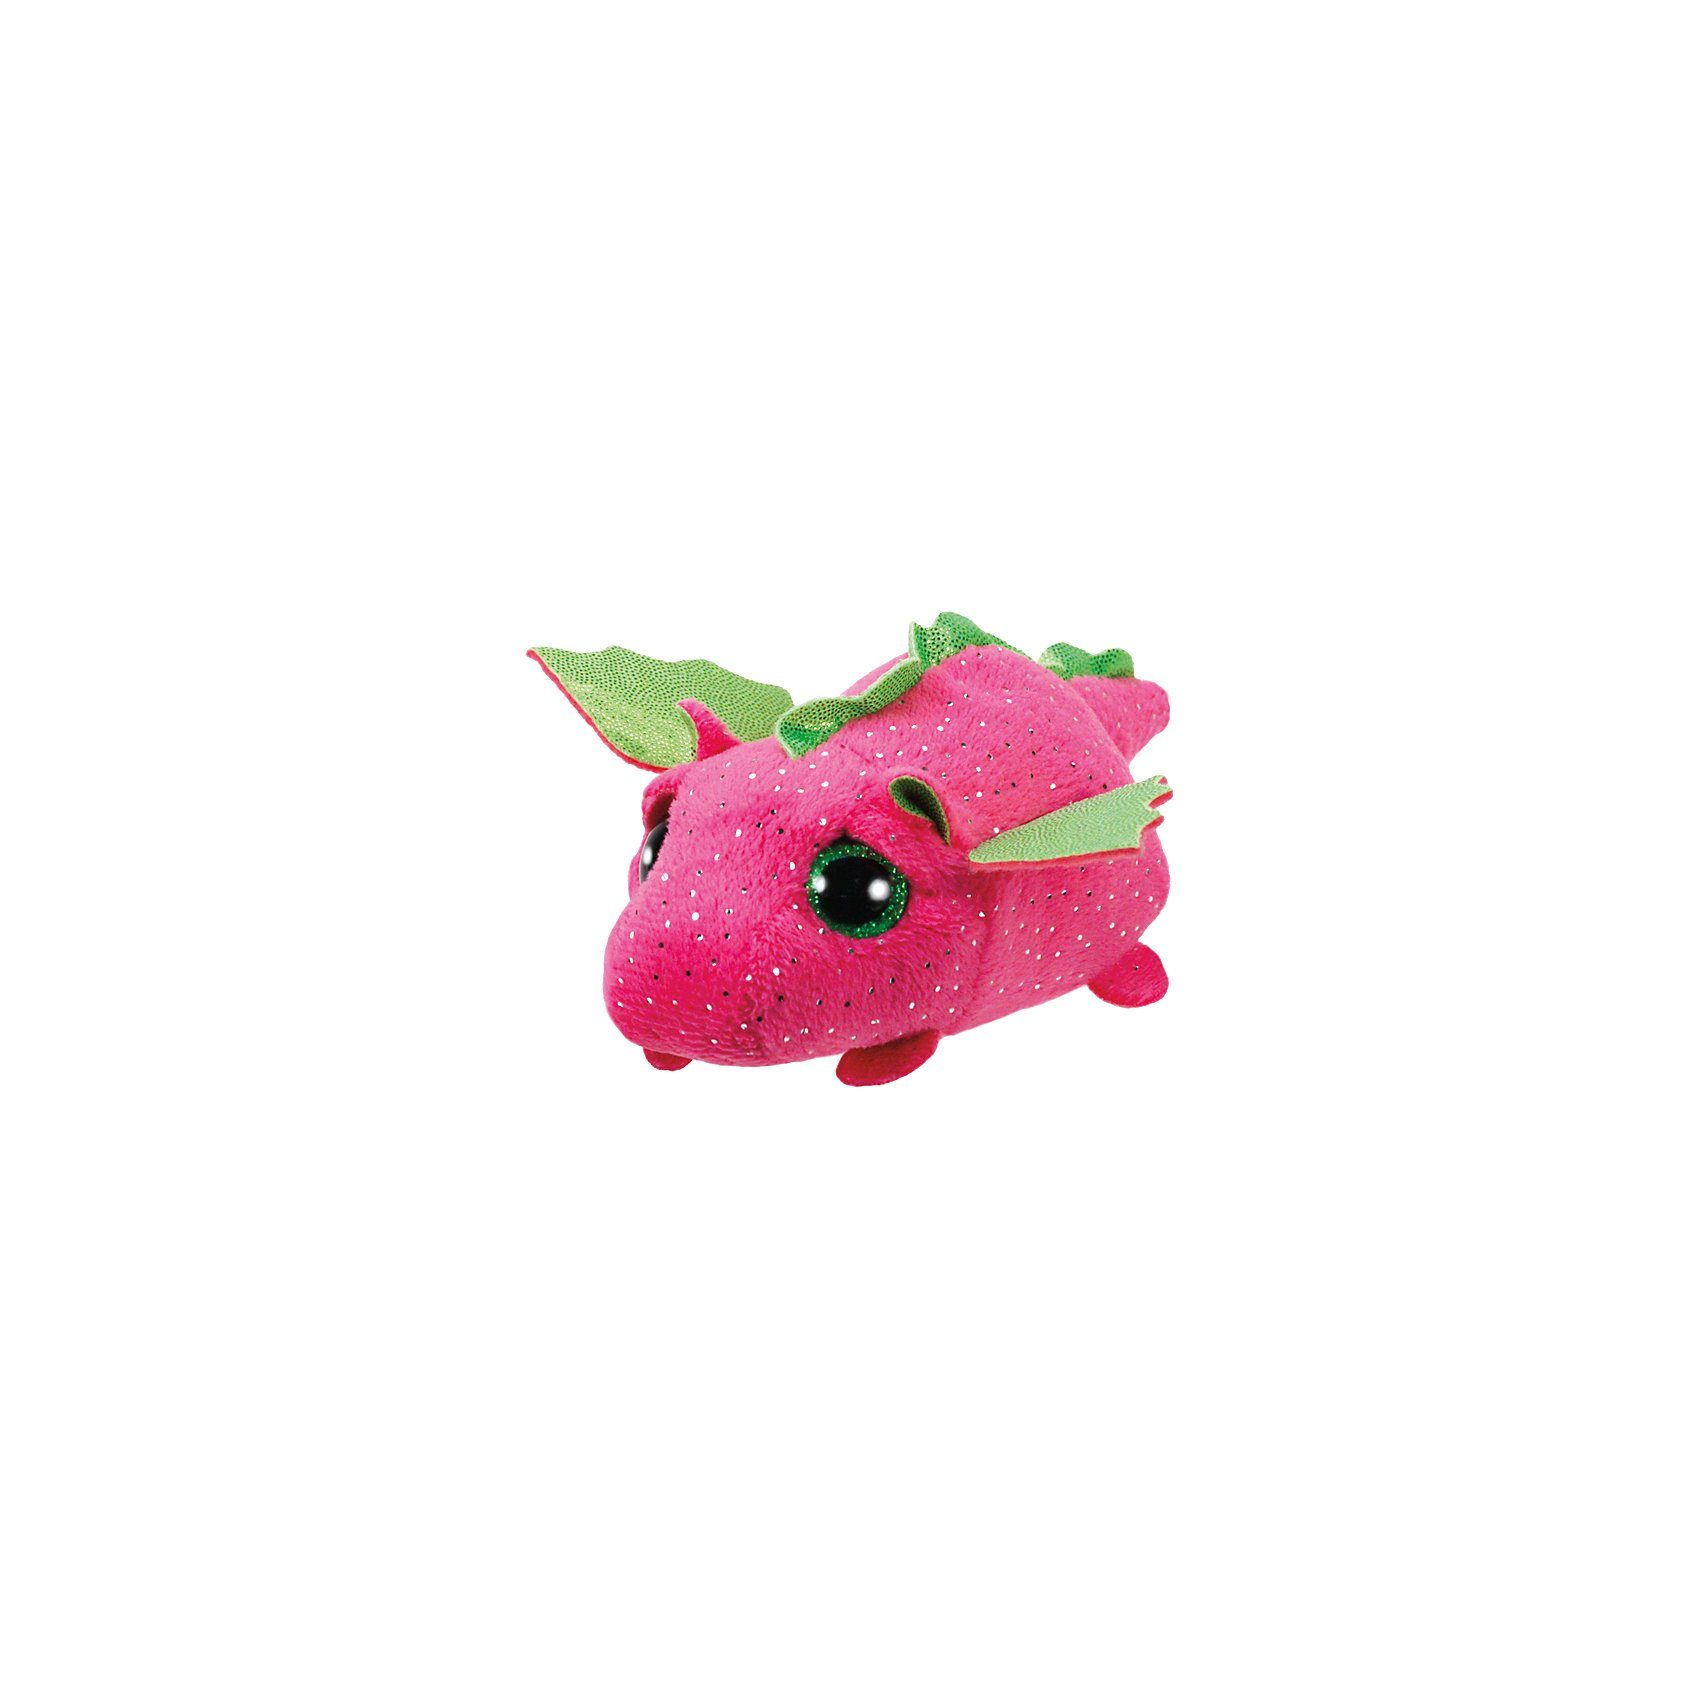 Ty® Beanie Boo Darby, Drache pink 10cm FIX6